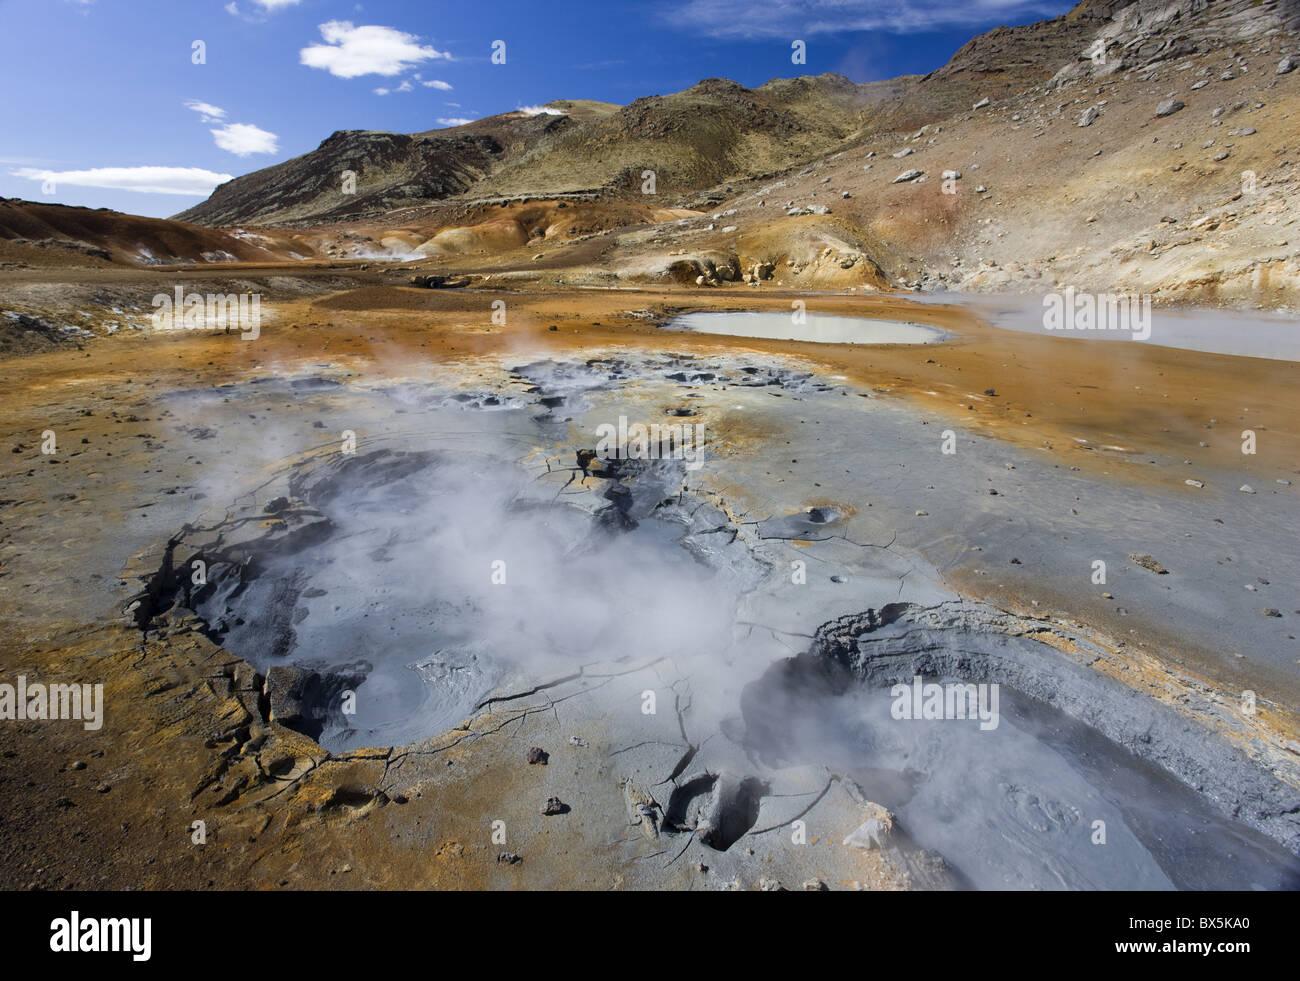 Dramatic volcanic landscape with boiling mudpools in geothermal area on Reykjanes Peninsula, near Keflavik, Iceland - Stock Image